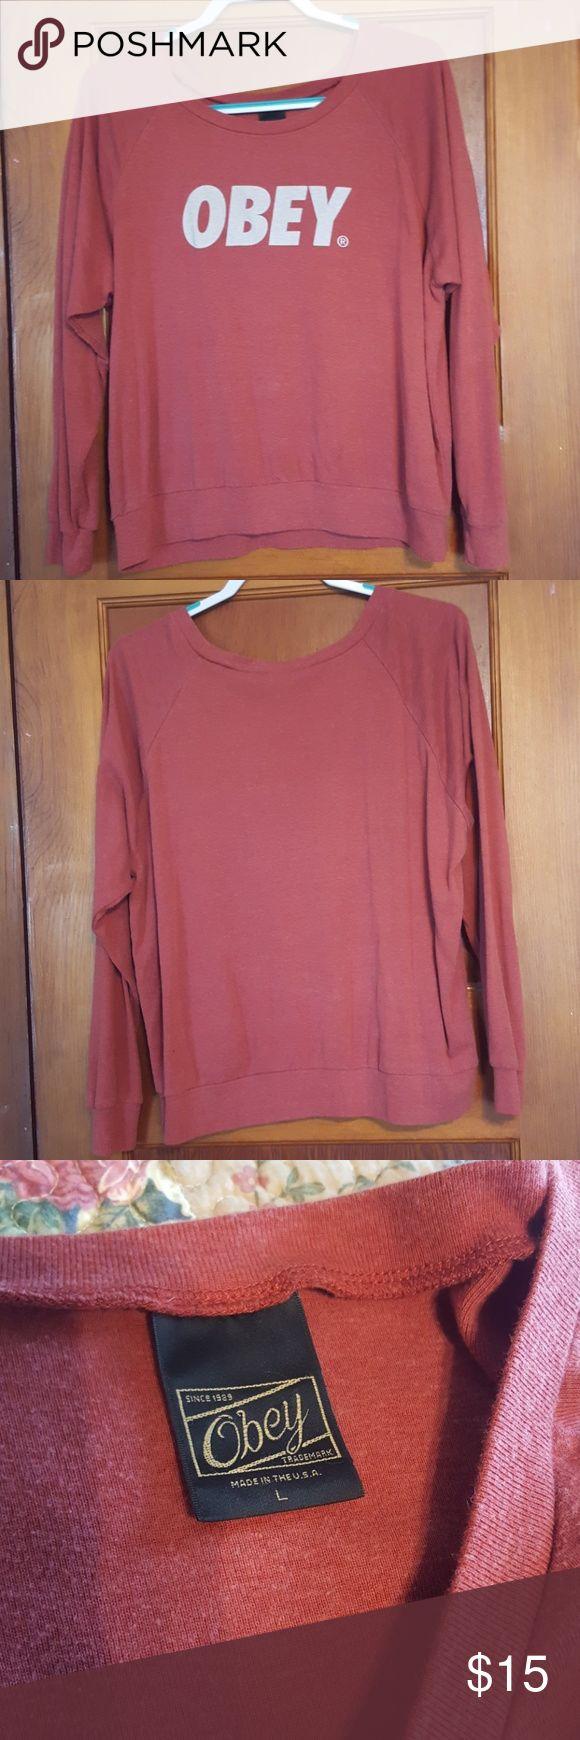 Obey Sweatshirt Obey Sweatshirt, size large, has a very worn look Obey Tops Sweatshirts & Hoodies